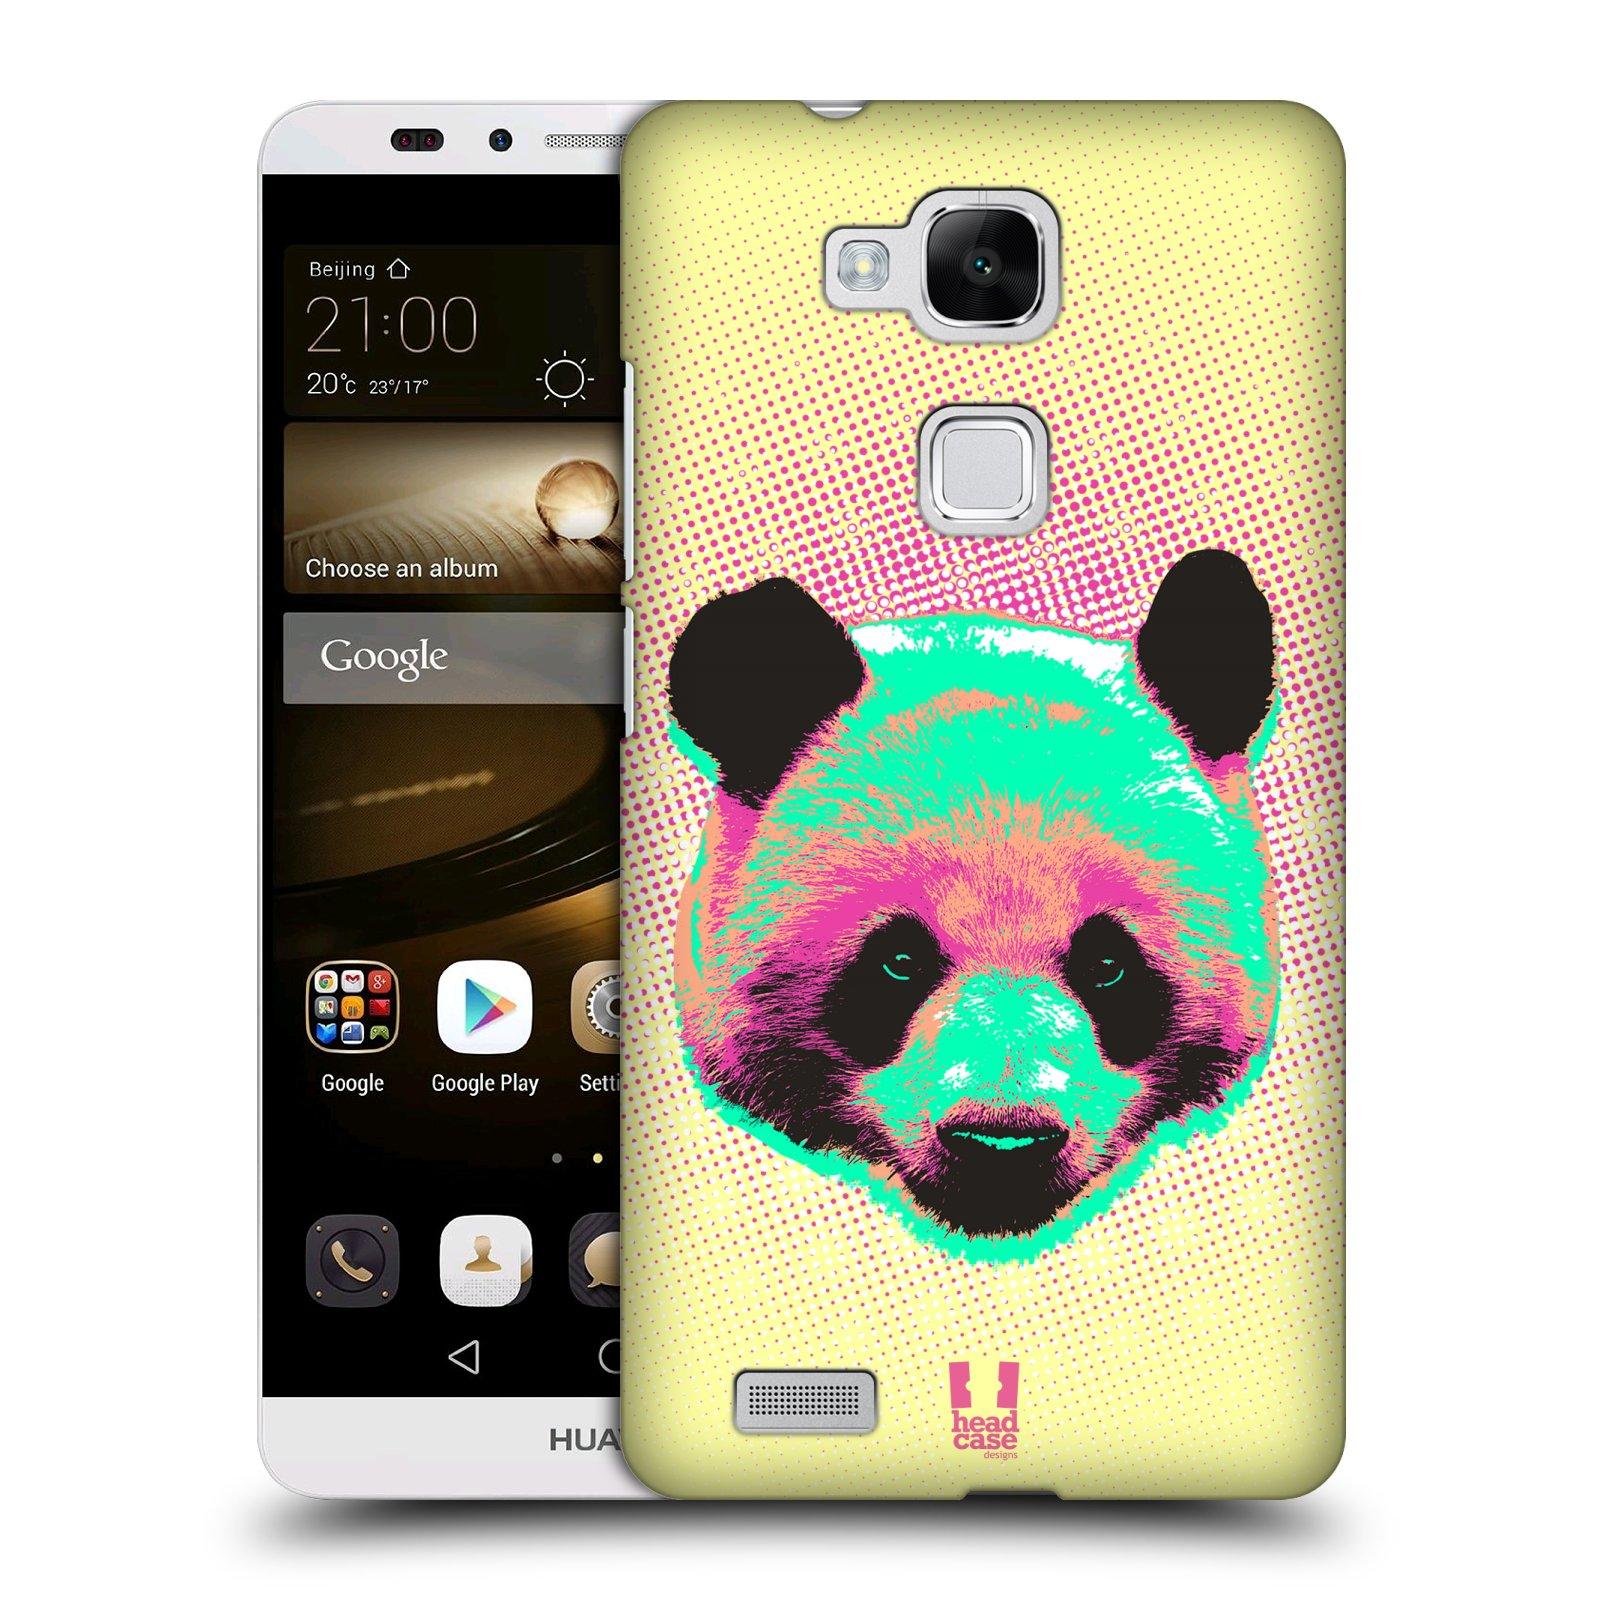 Plastové pouzdro na mobil Huawei Ascend Mate 7 HEAD CASE POP PRINT PANDA (Kryt či obal na mobilní telefon Huawei Ascend Mate7)